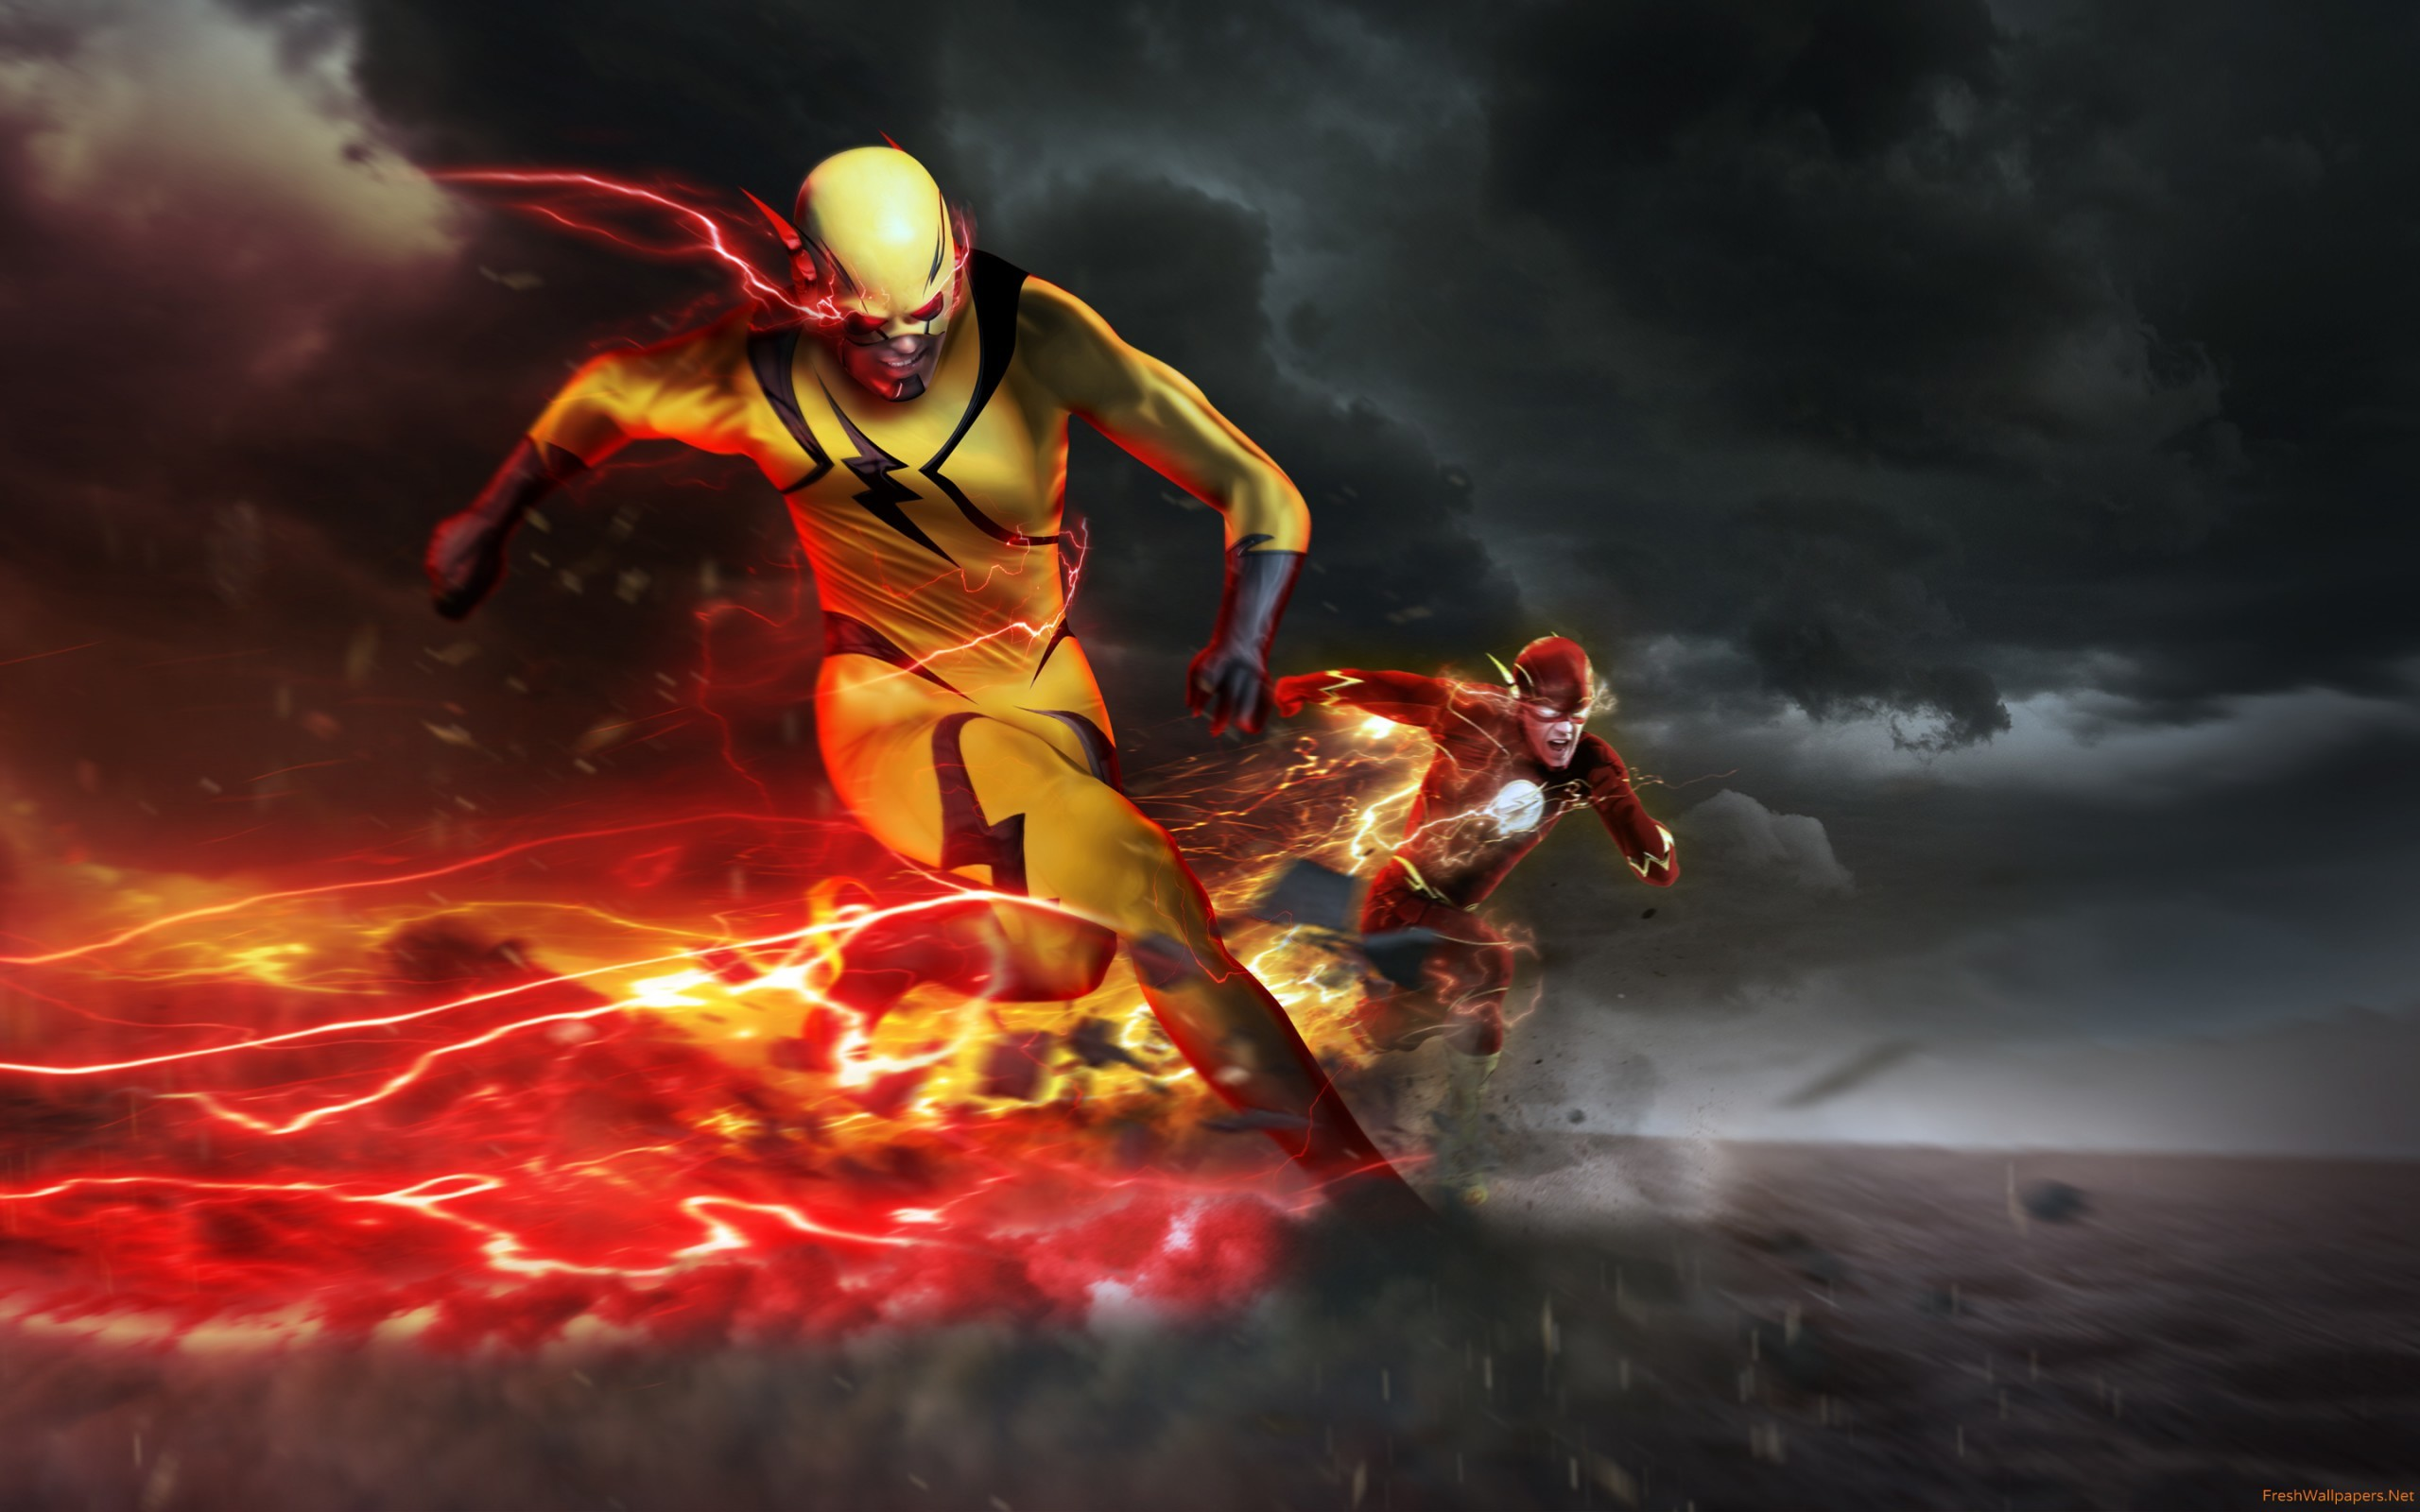 The Flash Season 3 The Flash Vs Eobard Thawne Wallpaper 05328